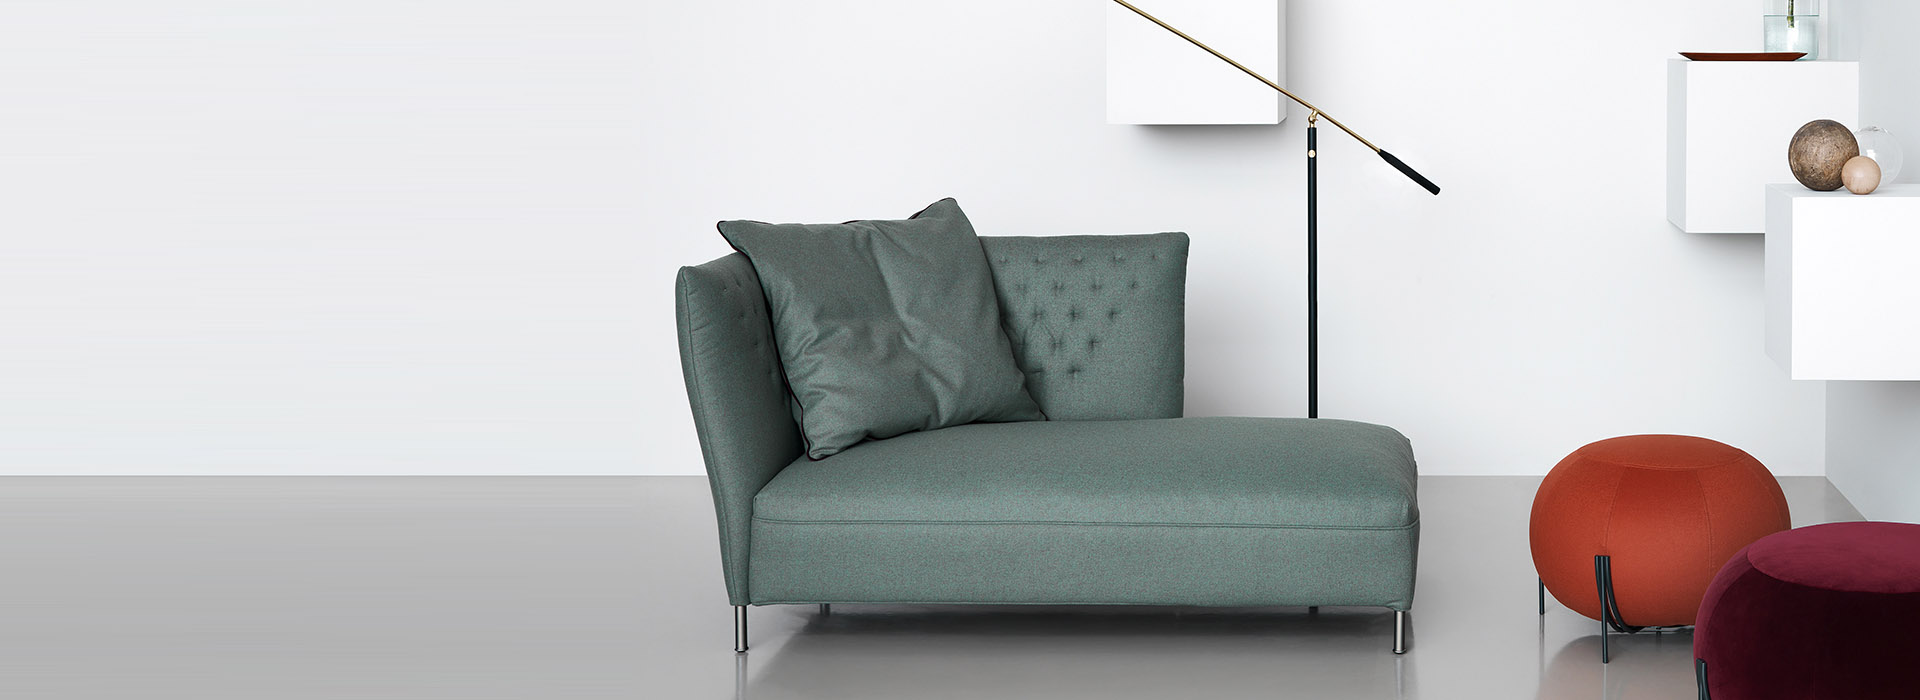 Quilt divani saba ginocchi arredamenti for Ginocchi arredamenti